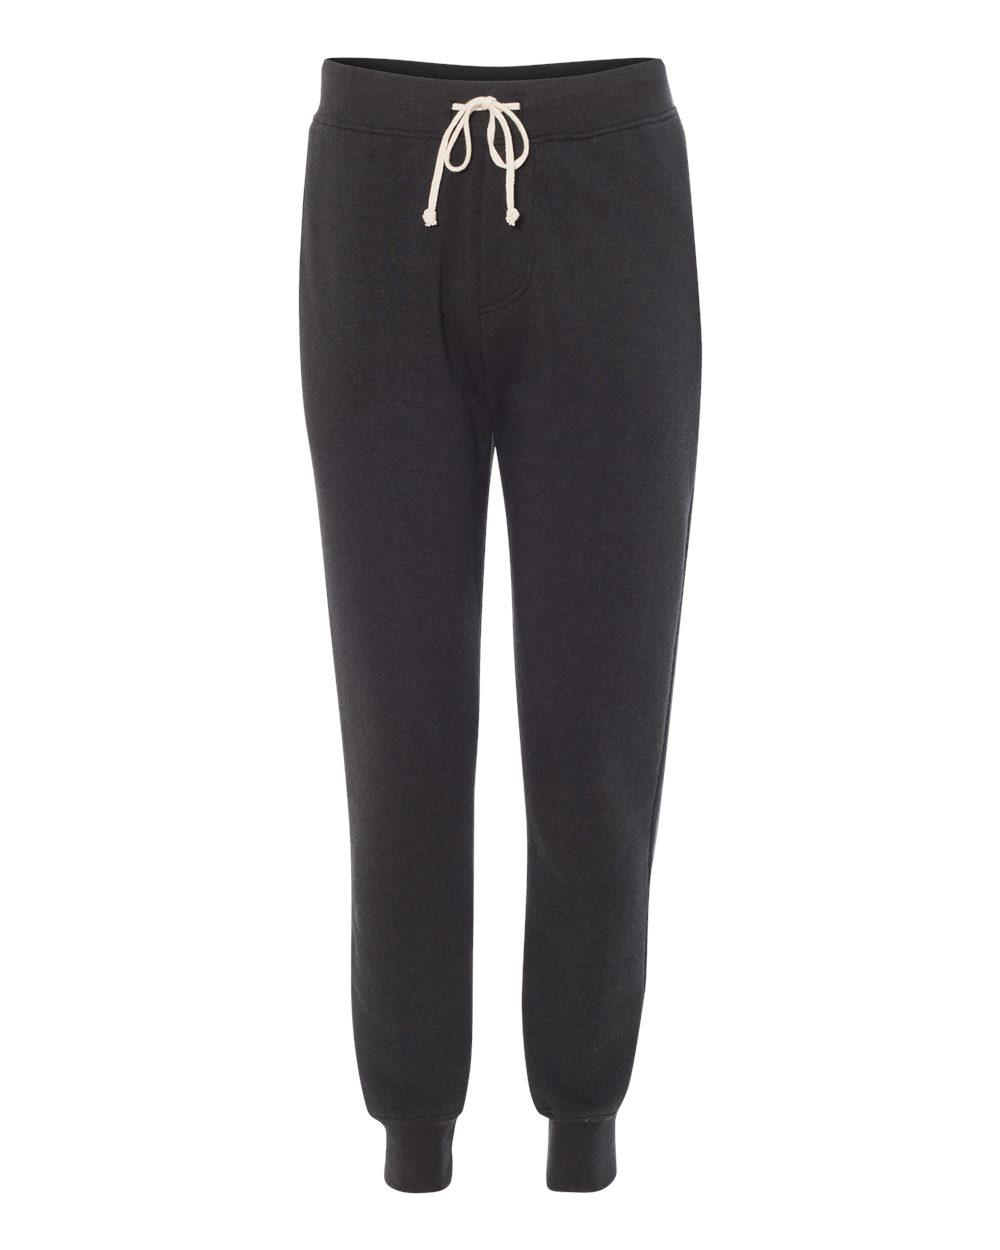 Alternative-Mens-Eco-Fleece-Dodgeball-Pants-Sweatpants-Pocket-9881-up-to-2XL thumbnail 15